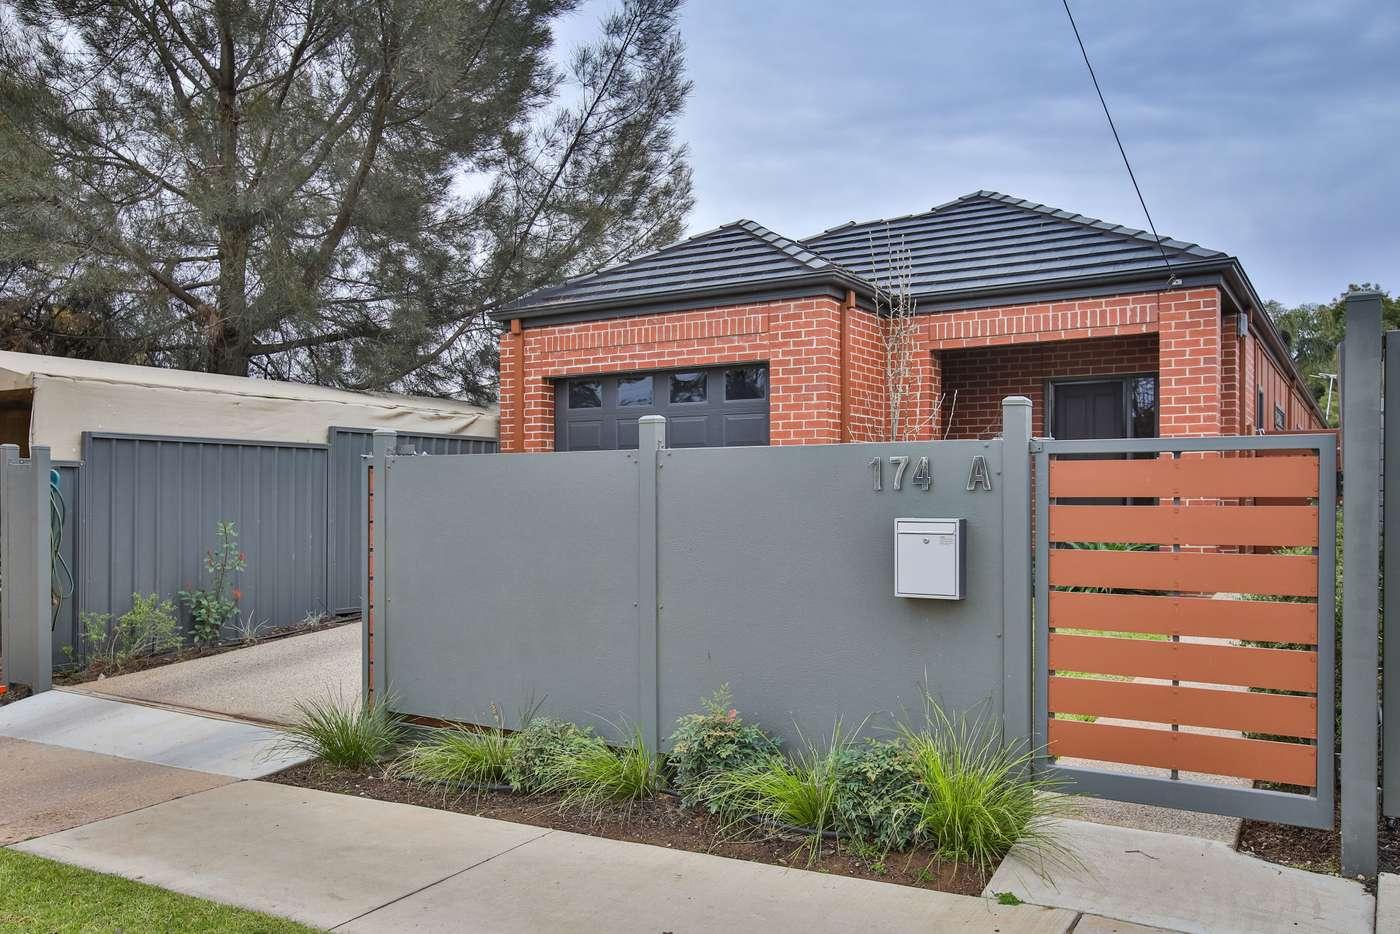 Main view of Homely house listing, 174a Thirteenth Street, Mildura VIC 3500